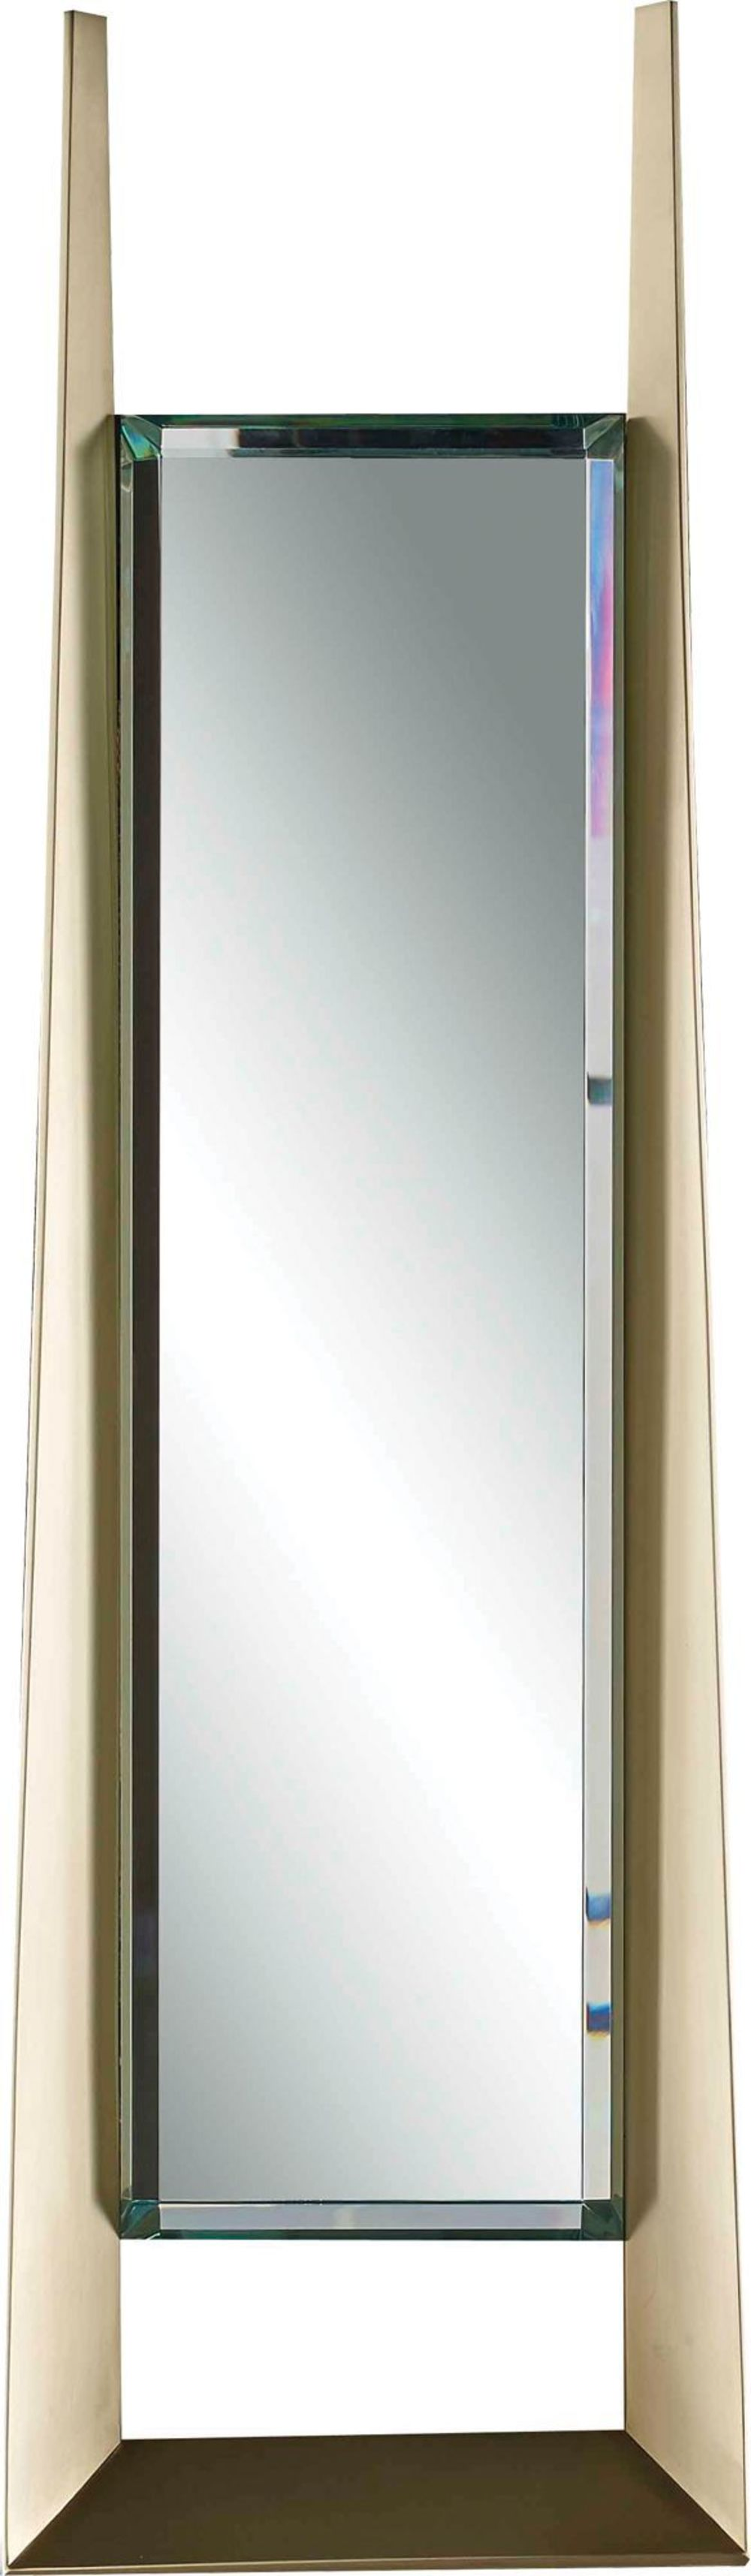 Baker Furniture - Baguette Mirror